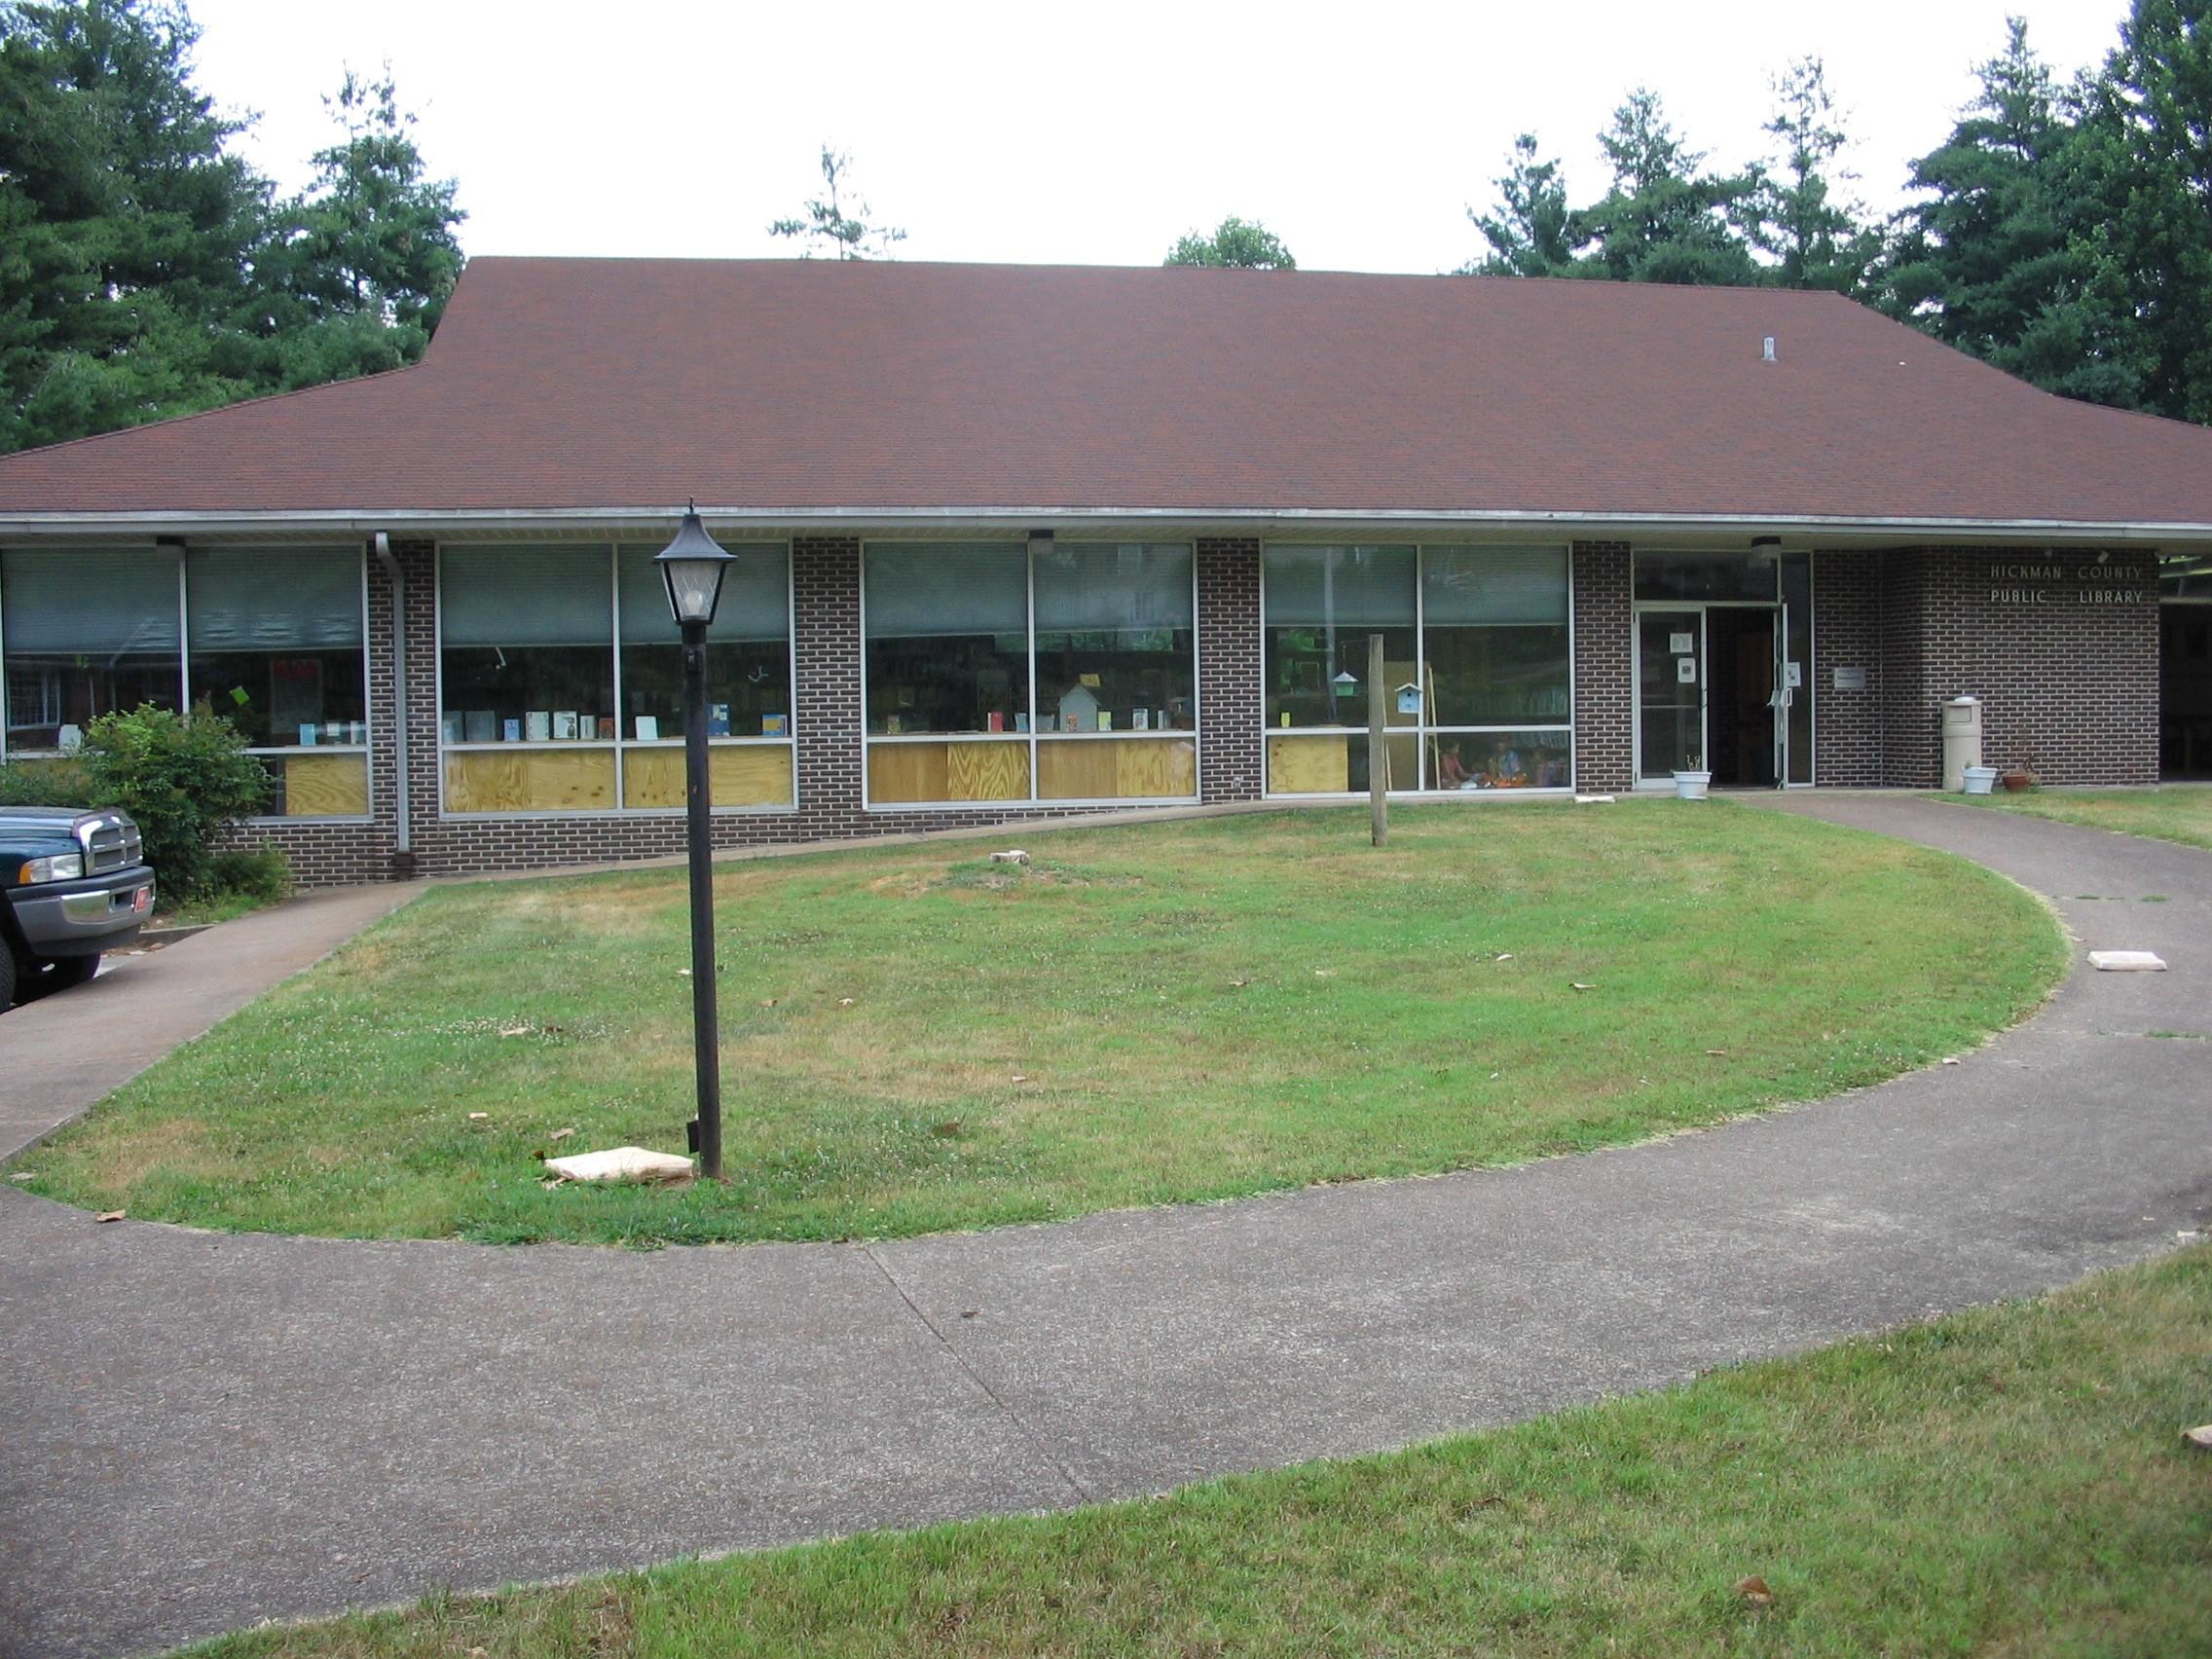 Hickman County Public Library